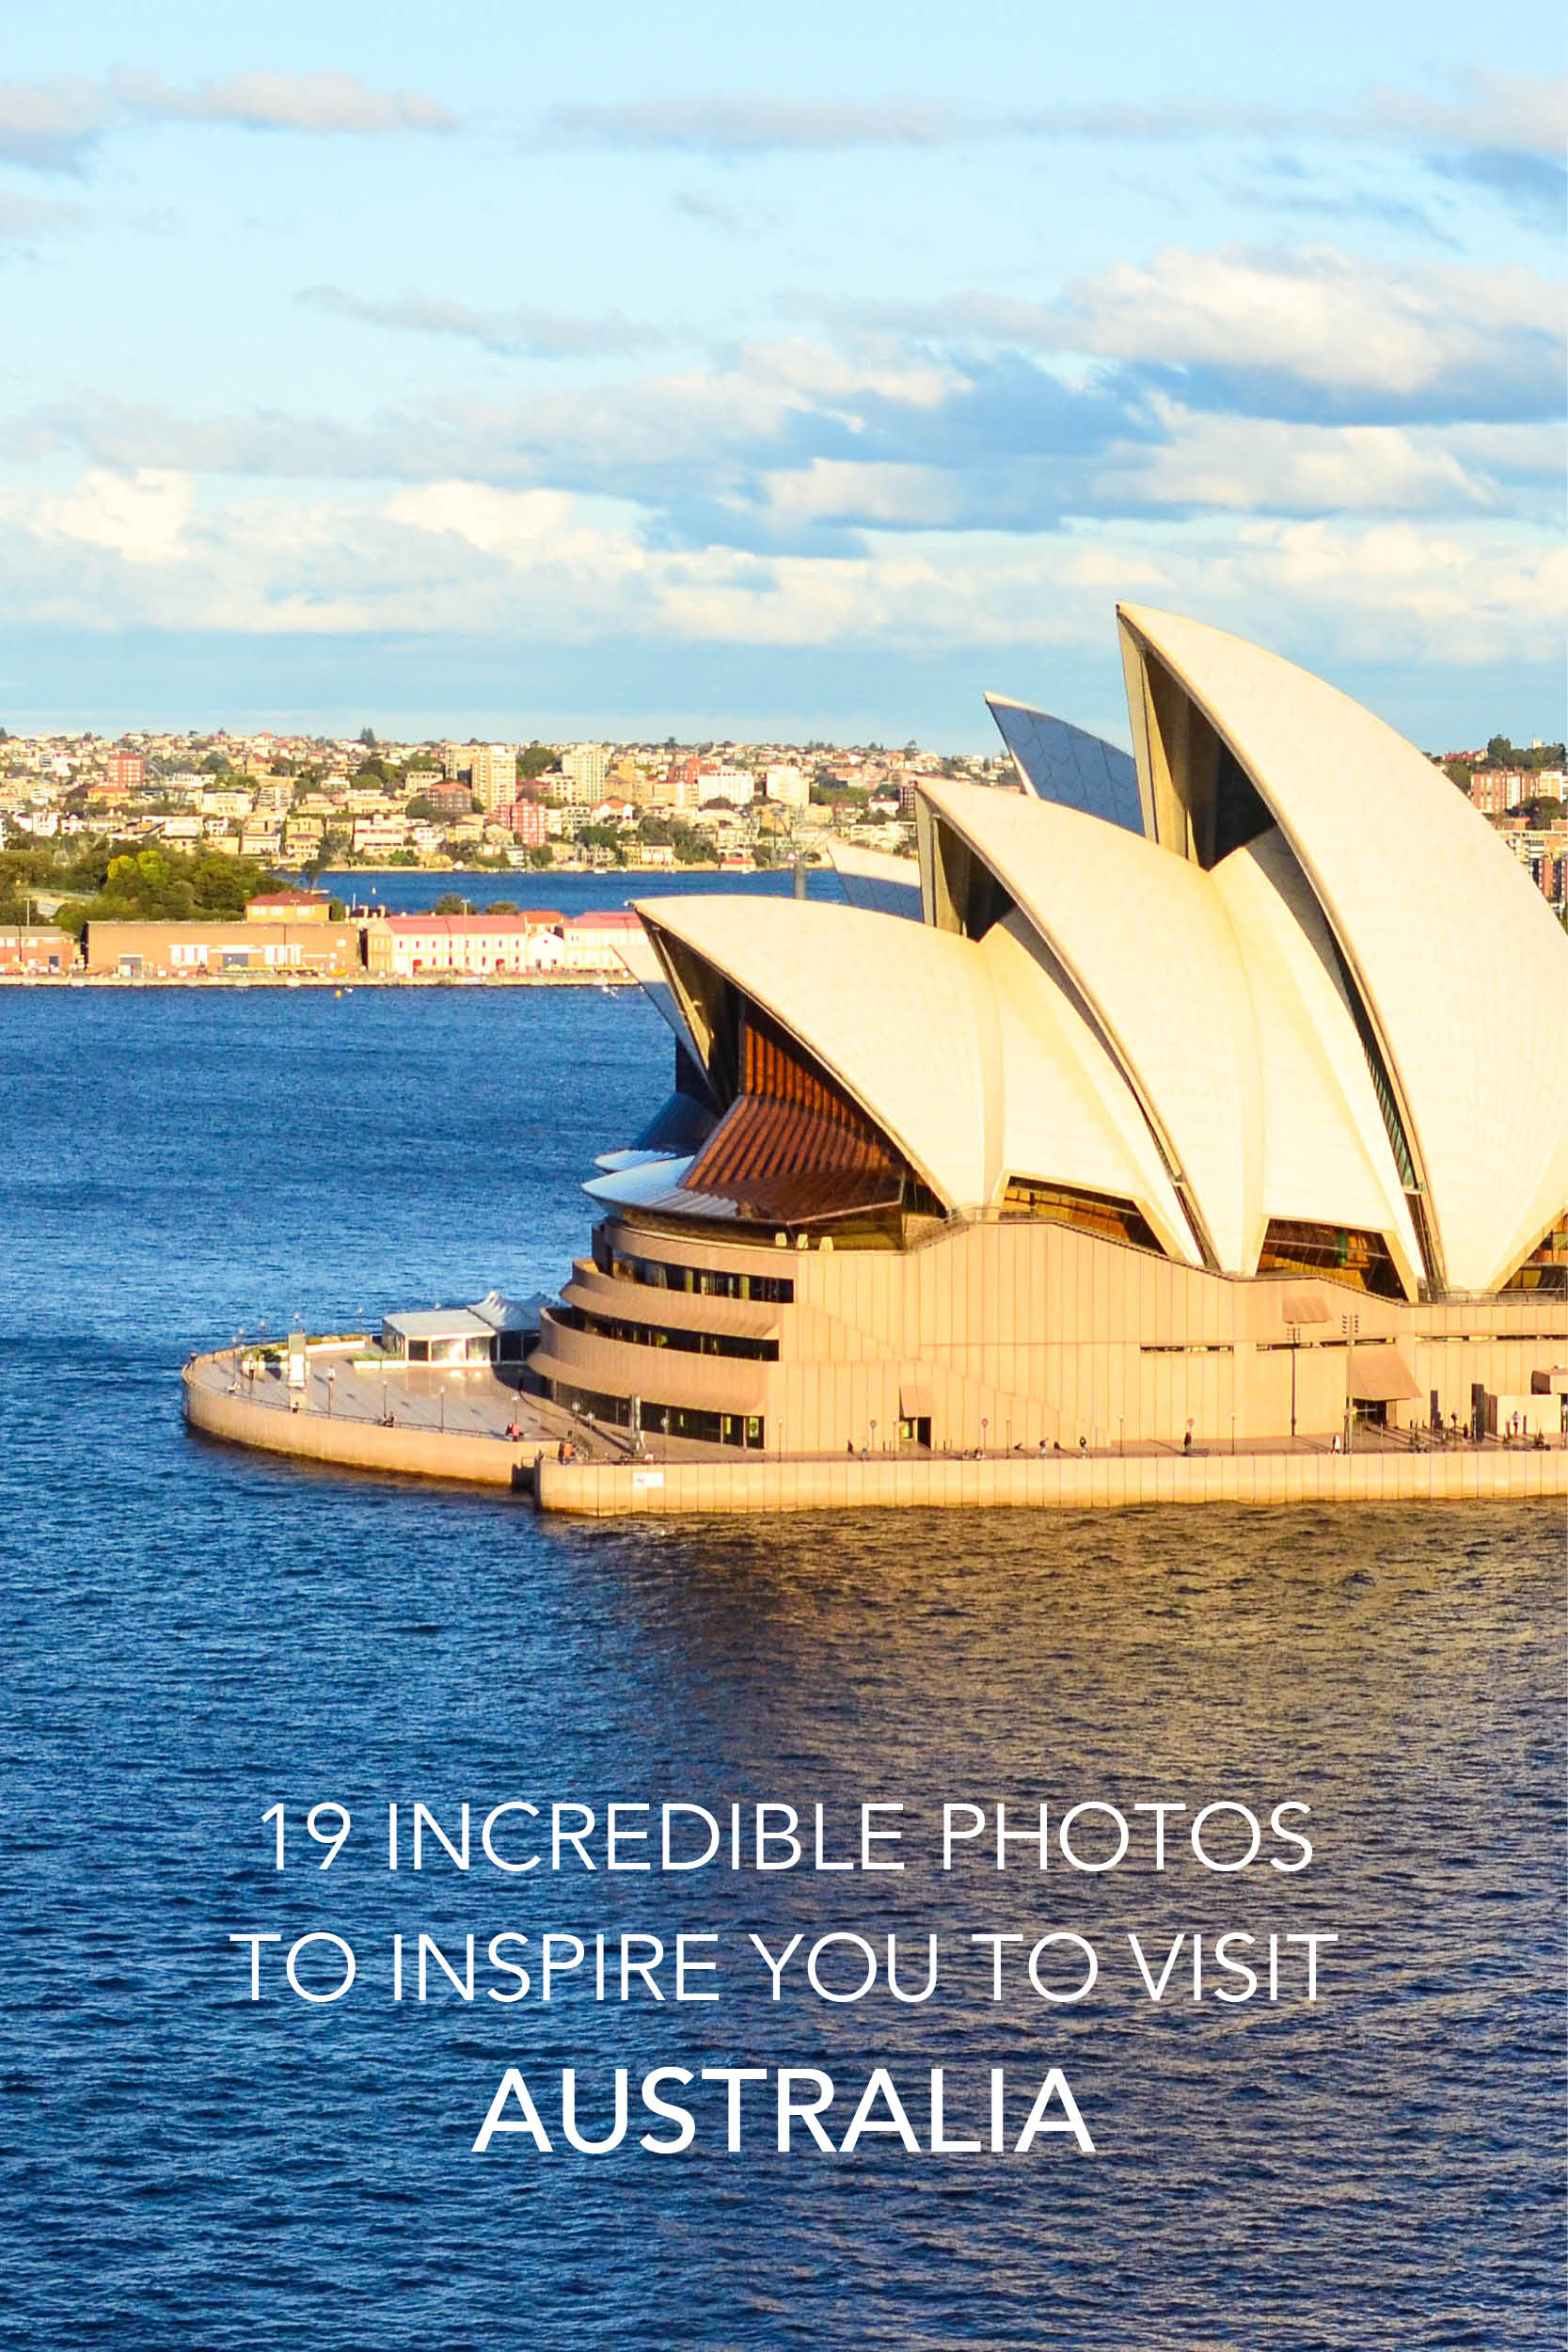 19 Photos to Inspire You To Visit Australia - Sydney Opera House.jpg